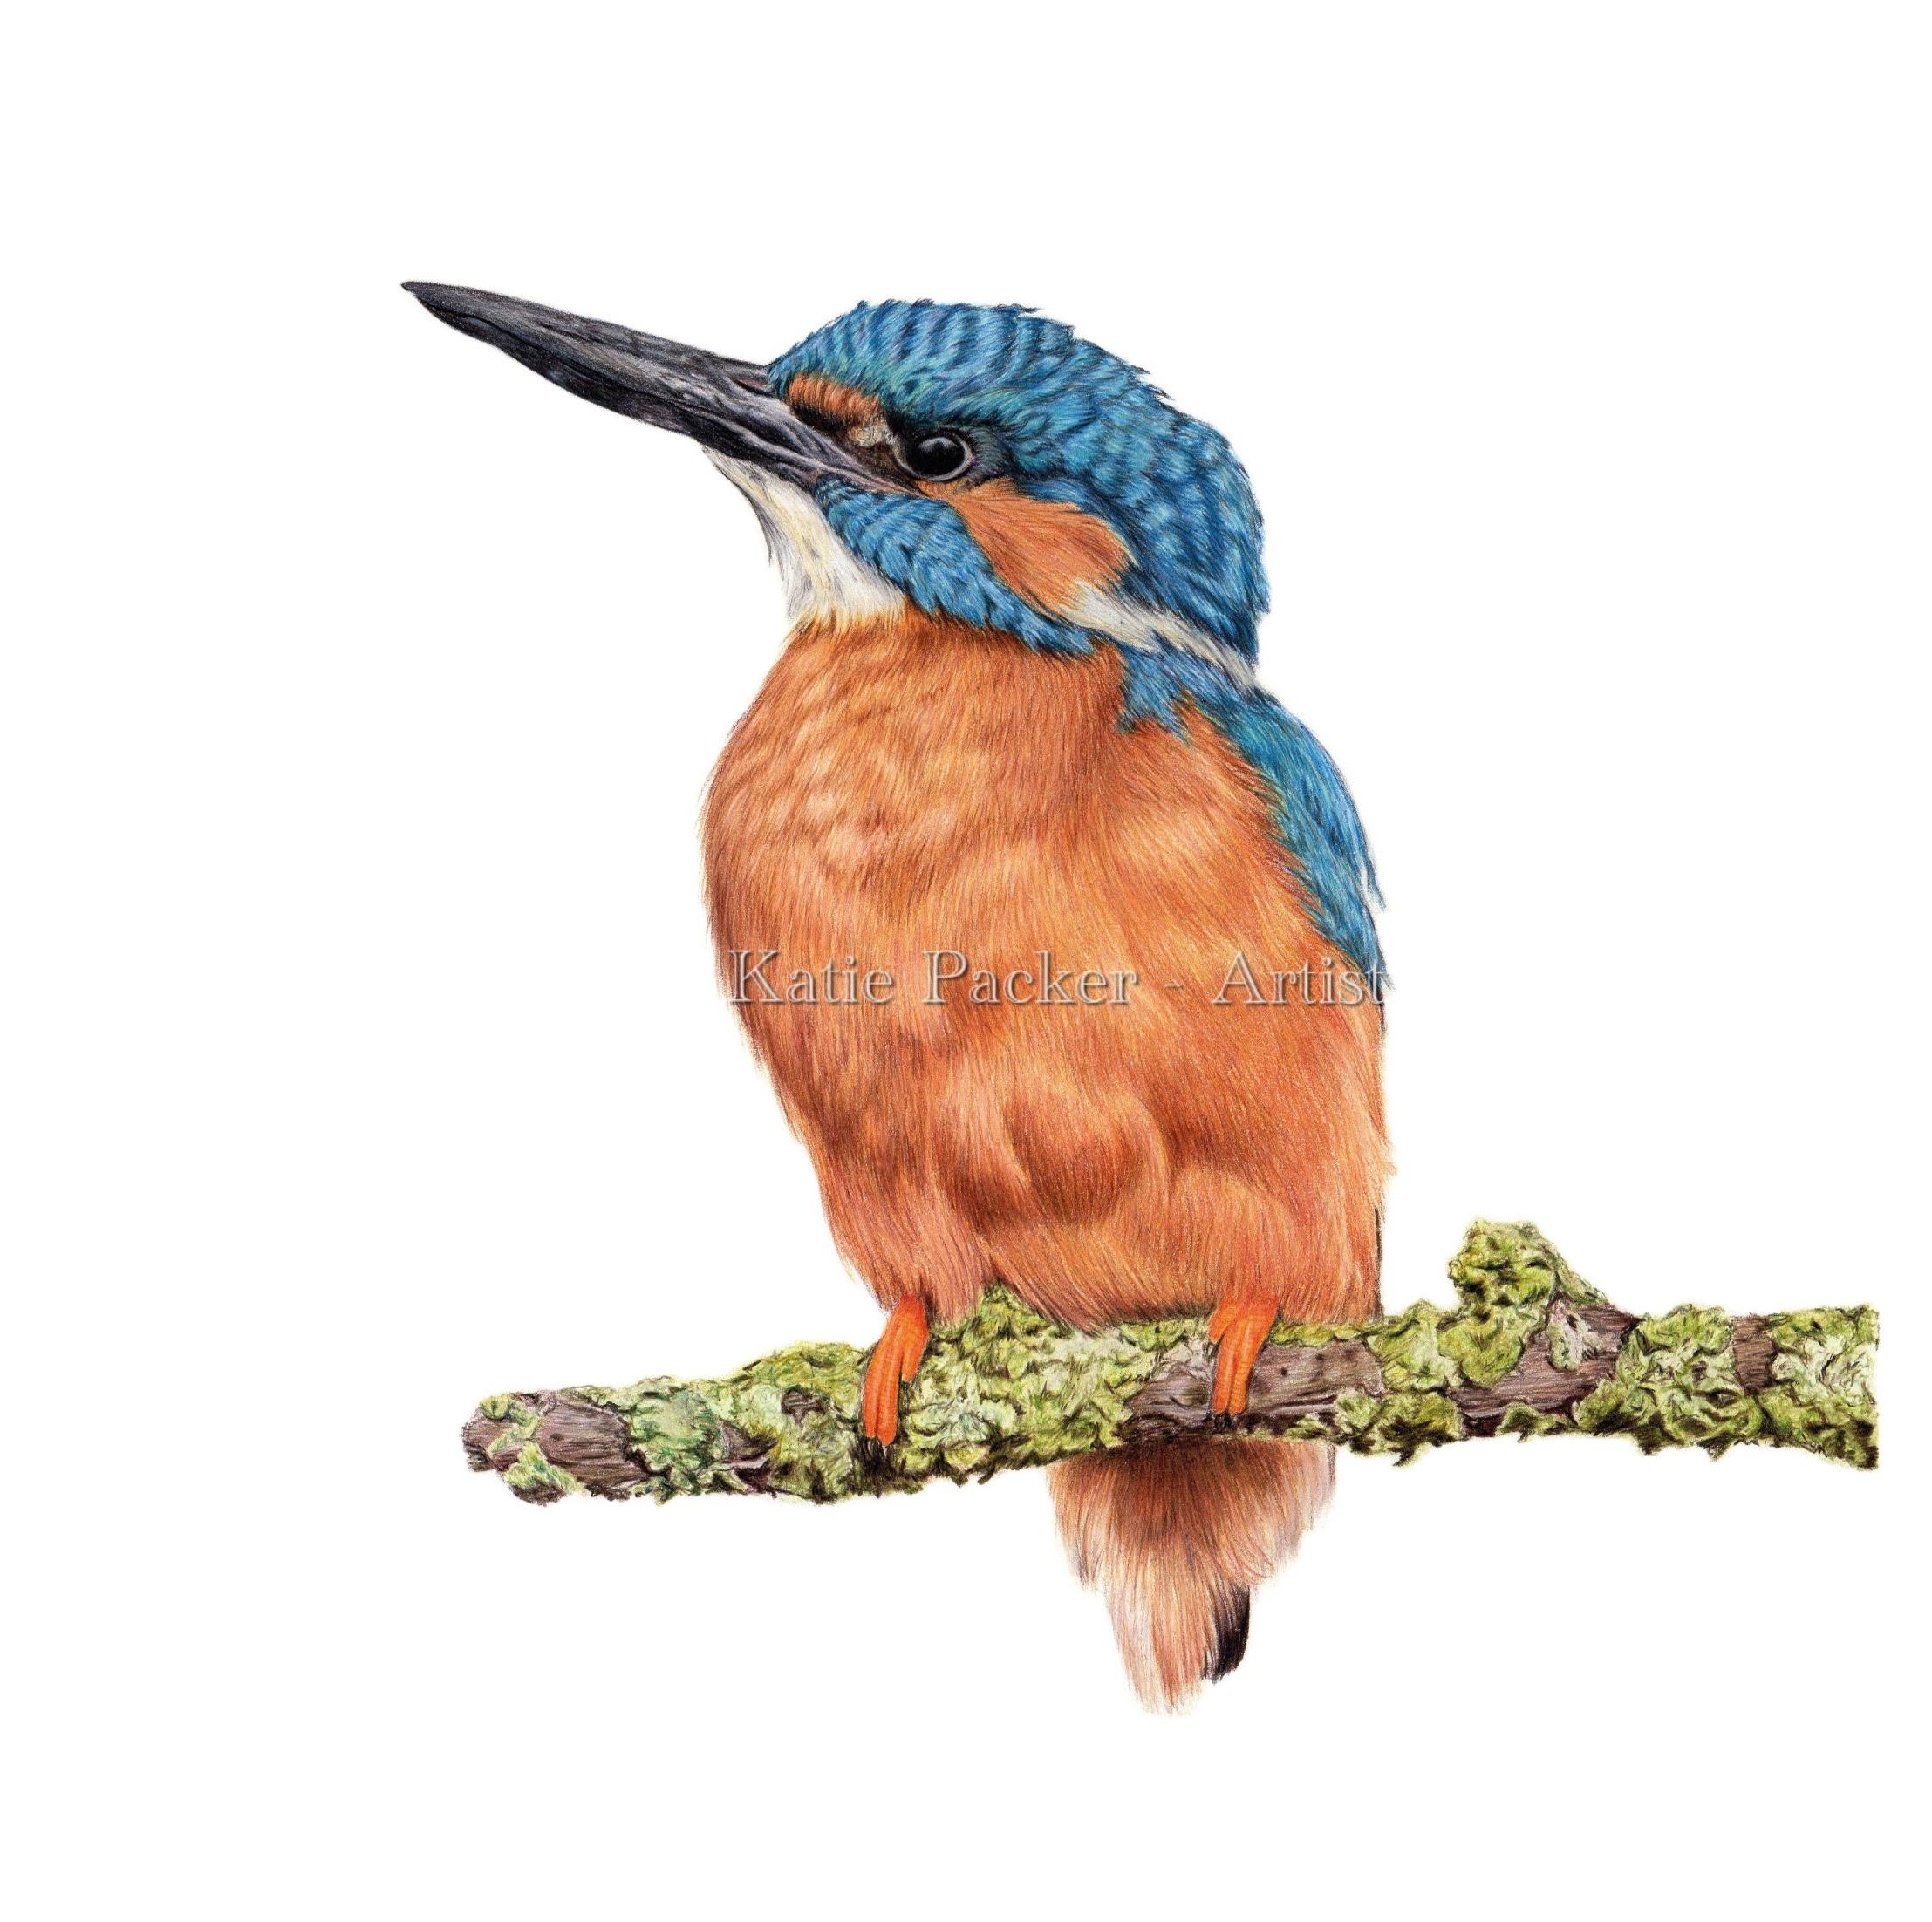 2215x2204 original 'patience', kingfisher drawing katie packer artist